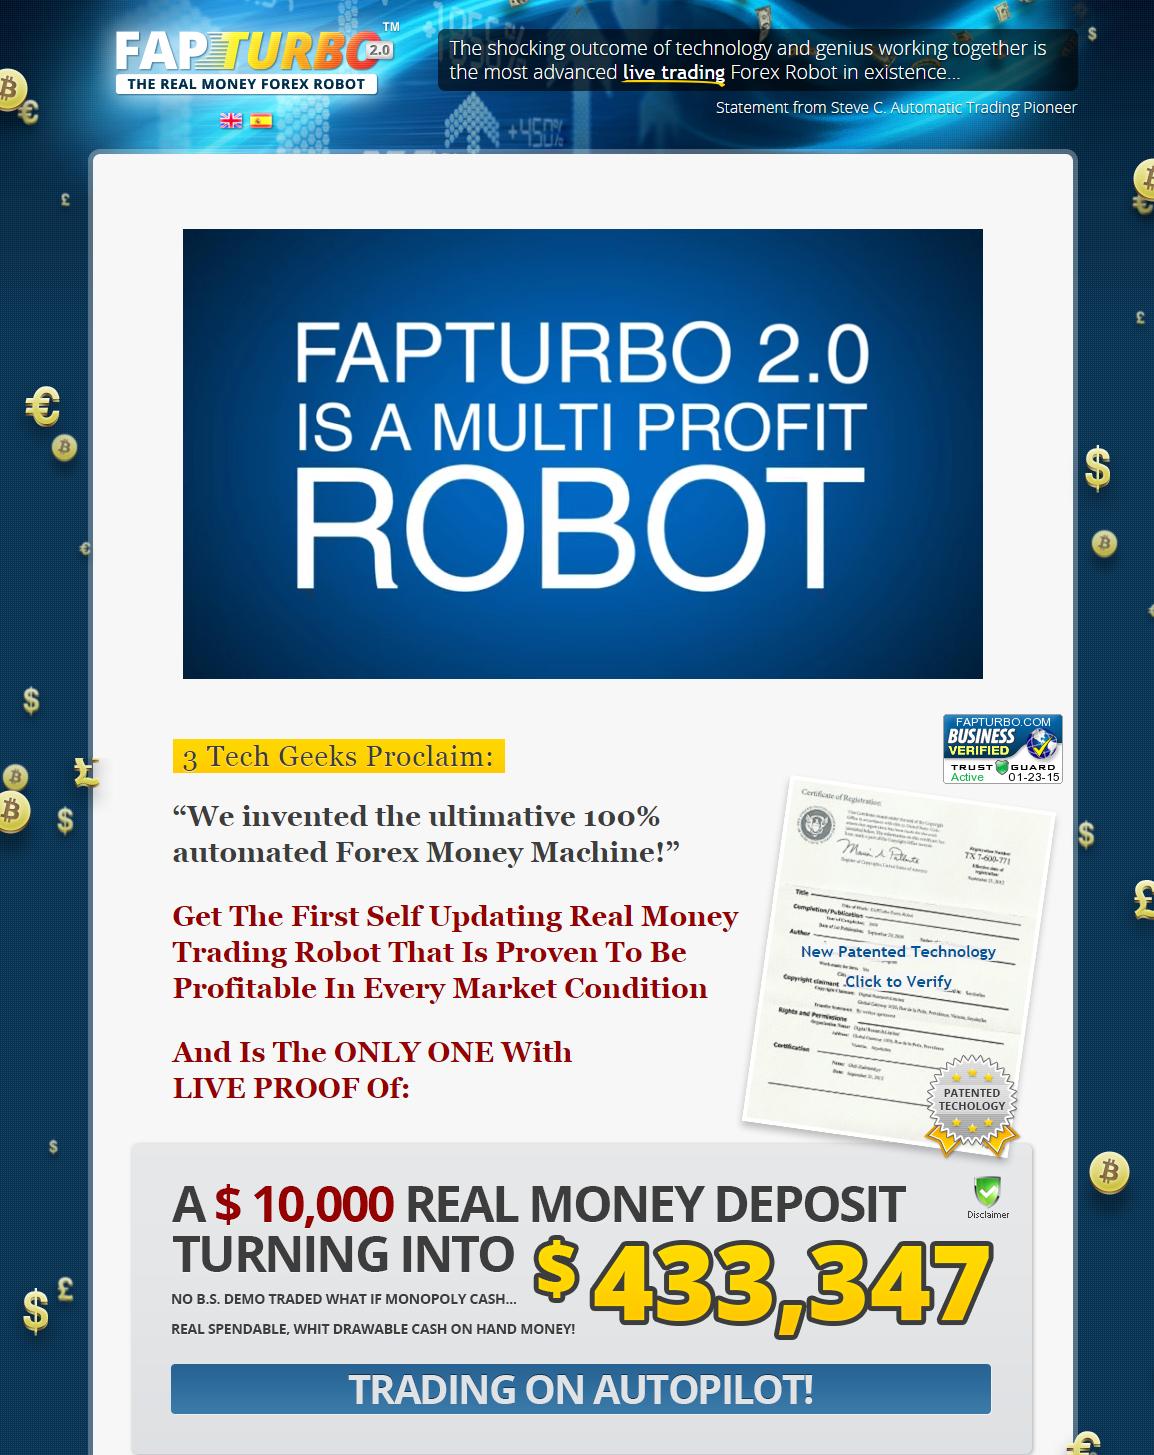 FapTurbo 2